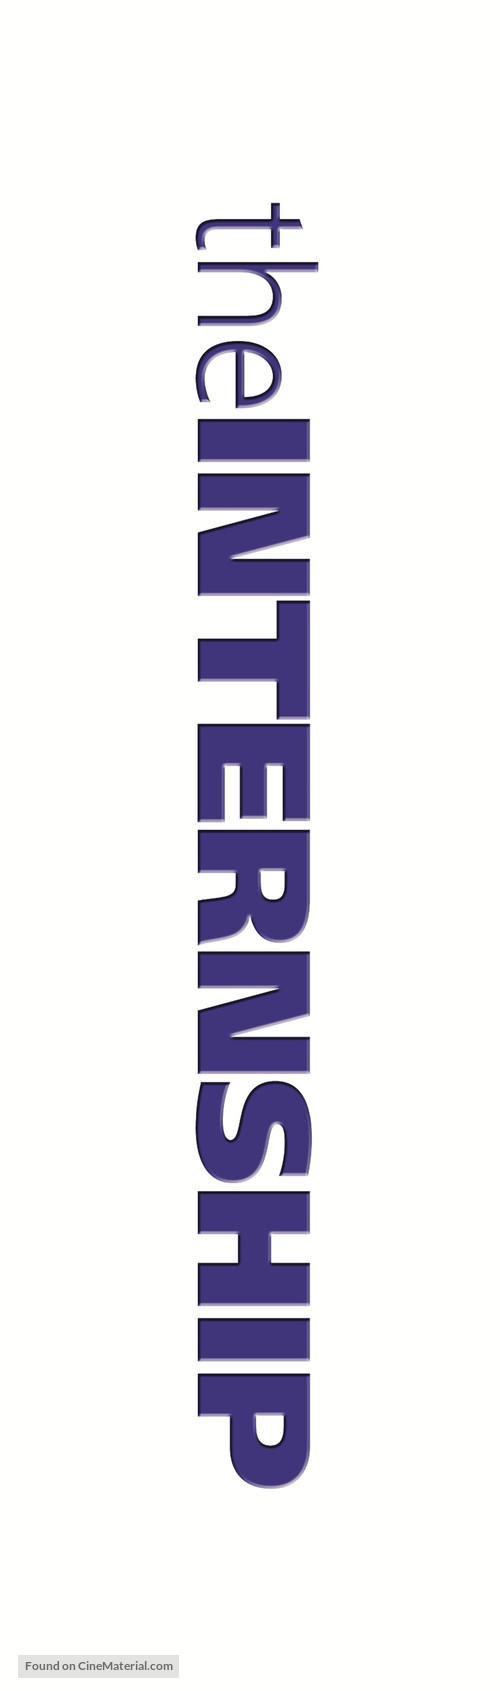 The Internship - Logo